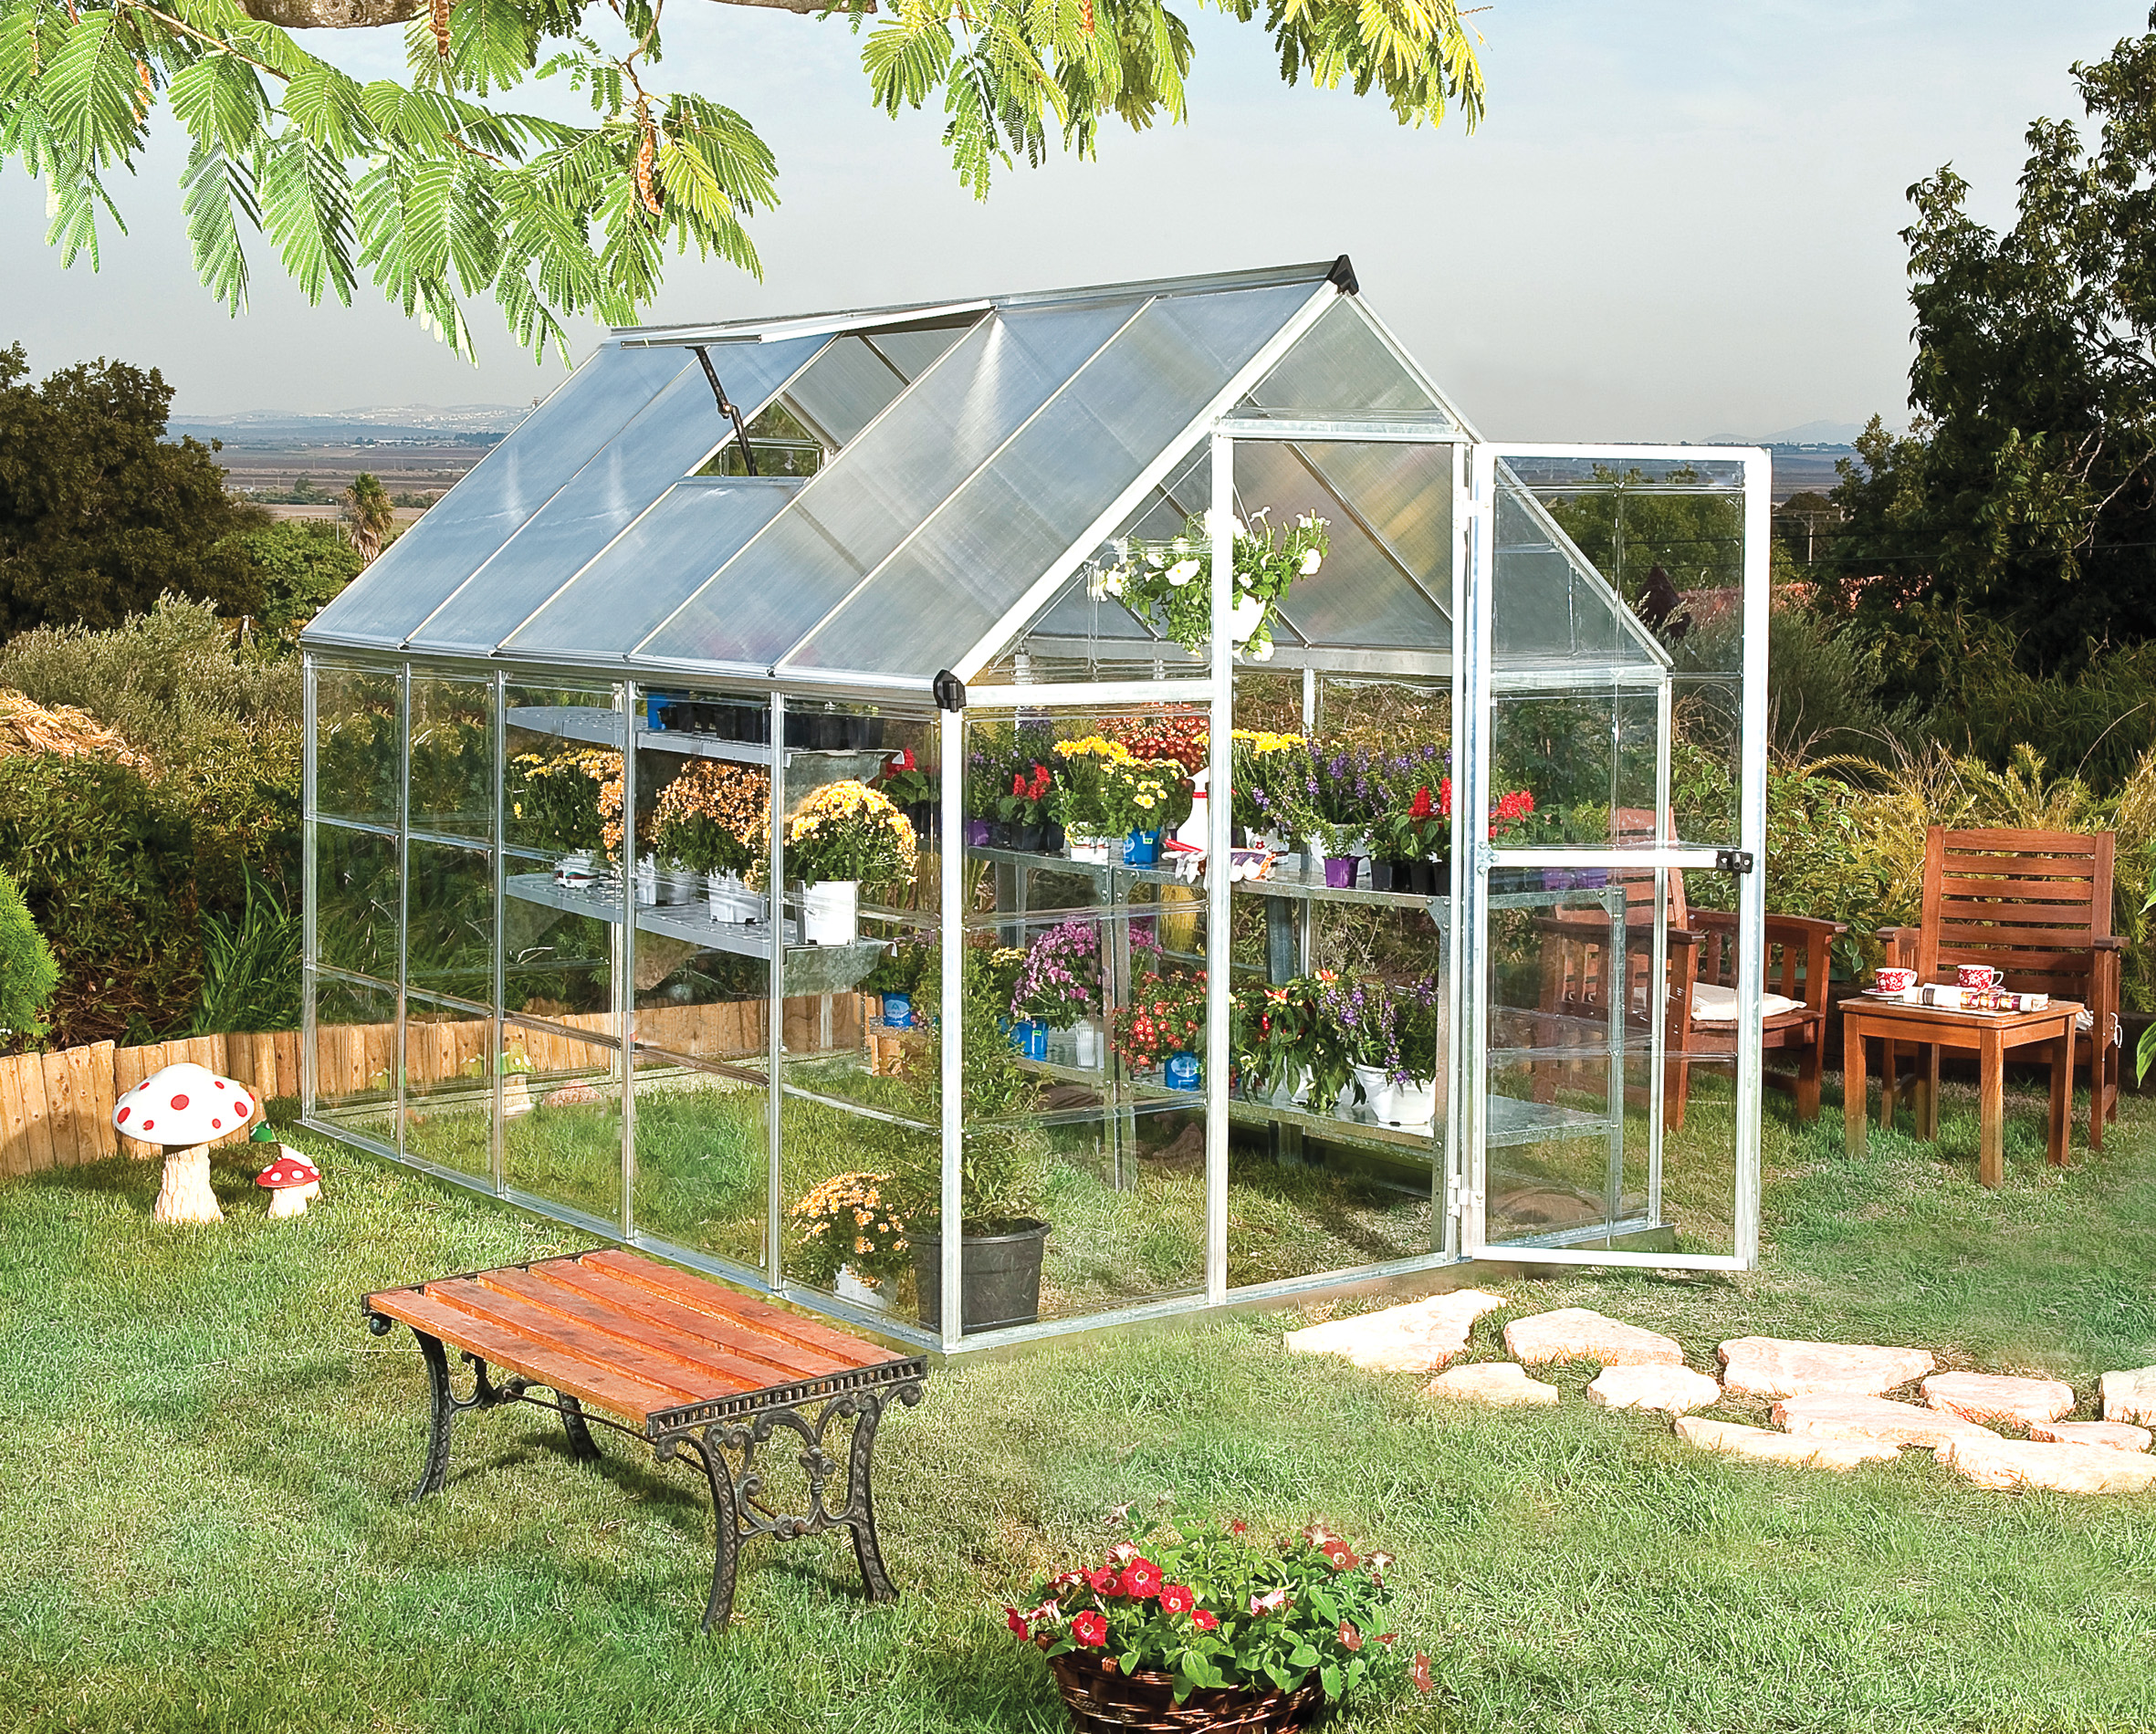 polykarbonátový skleník Palram hybrid 6x10 + ZDARMA základna skleníku + ZDARMA automatický otvírač oken + hnojivo Biocin-FF + prodloužená ZÁRUKA 10 LET